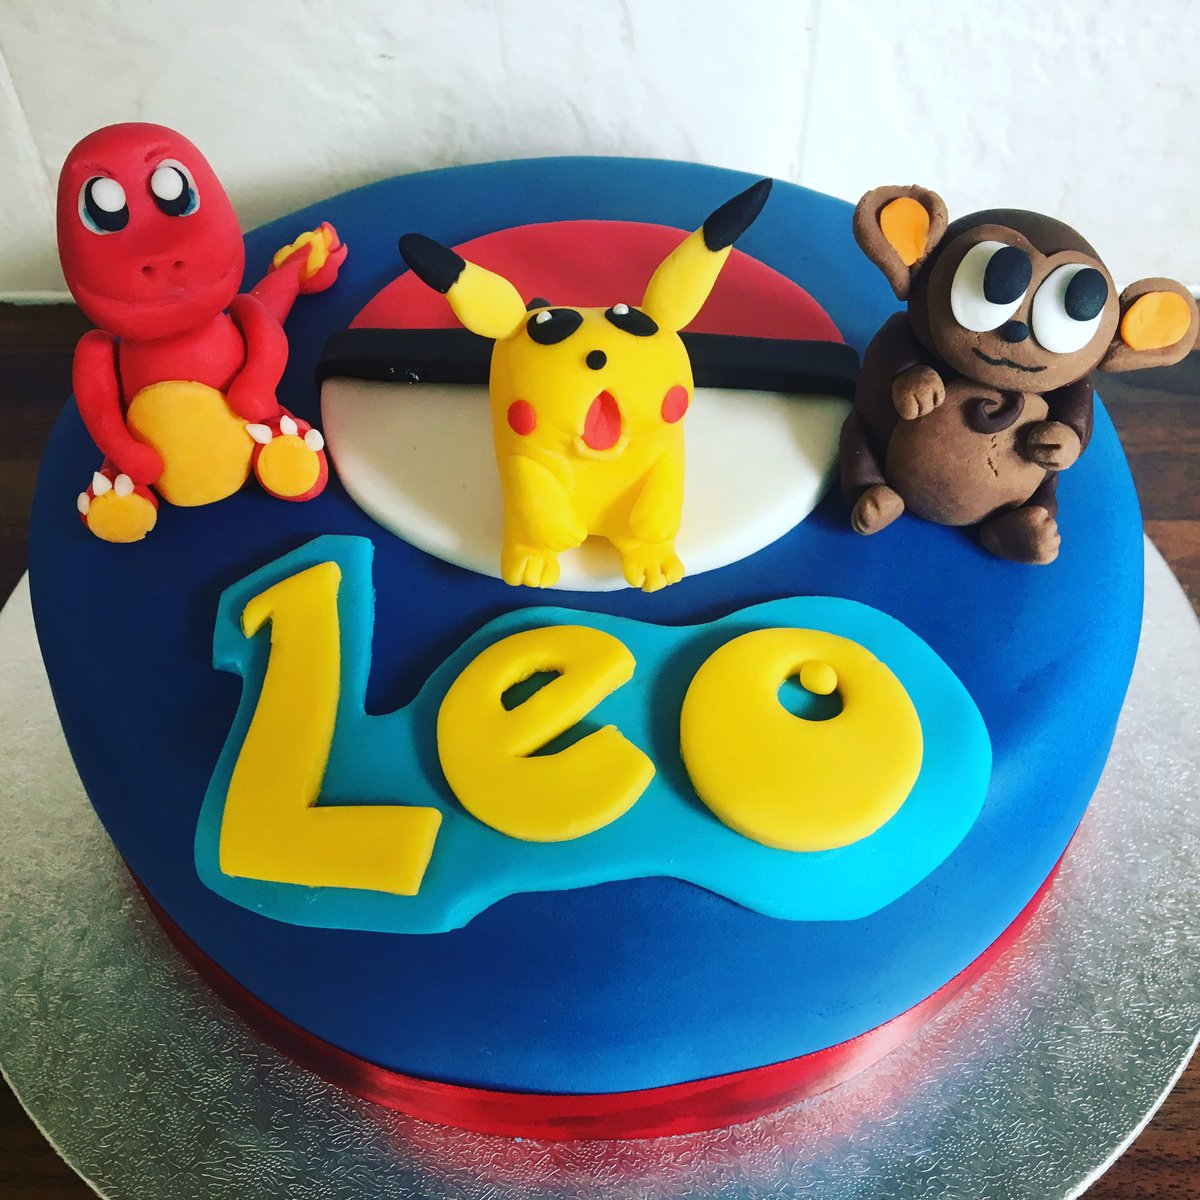 Fantastic Hannahmakescakes On Twitter Happy Pokemon Birthday Leo Cake Funny Birthday Cards Online Alyptdamsfinfo